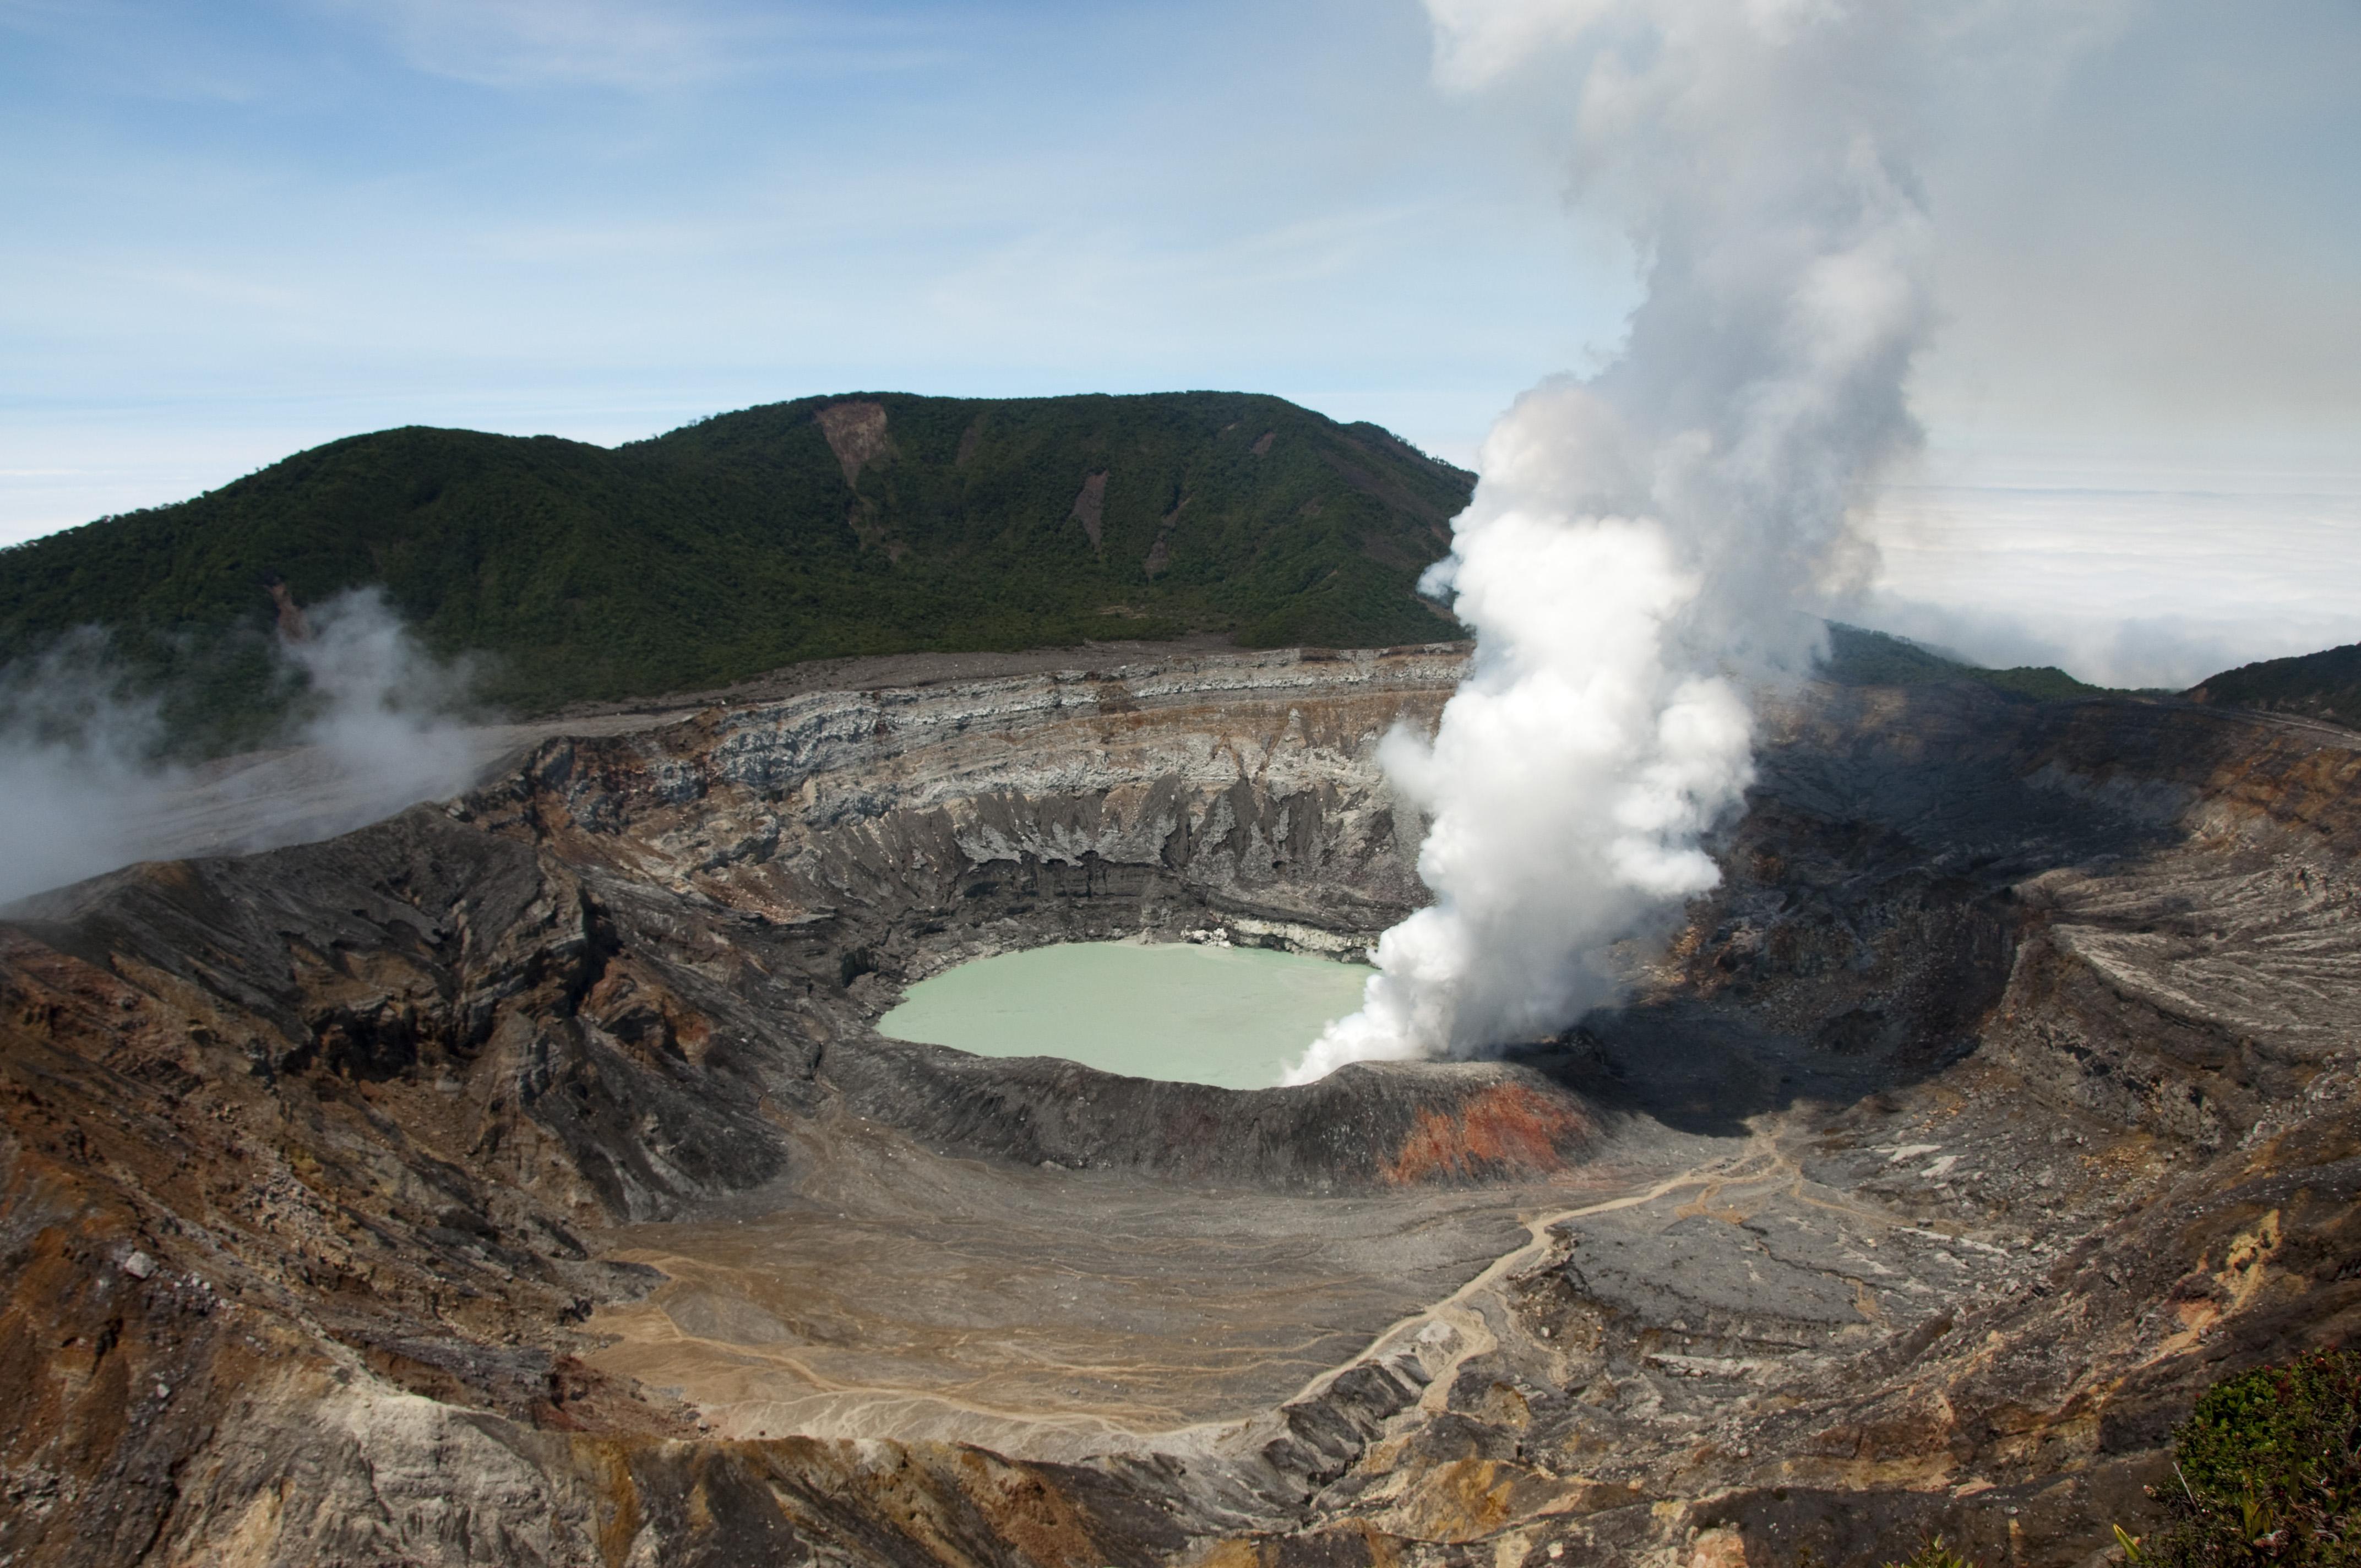 Visit Poas National Park when it reopens